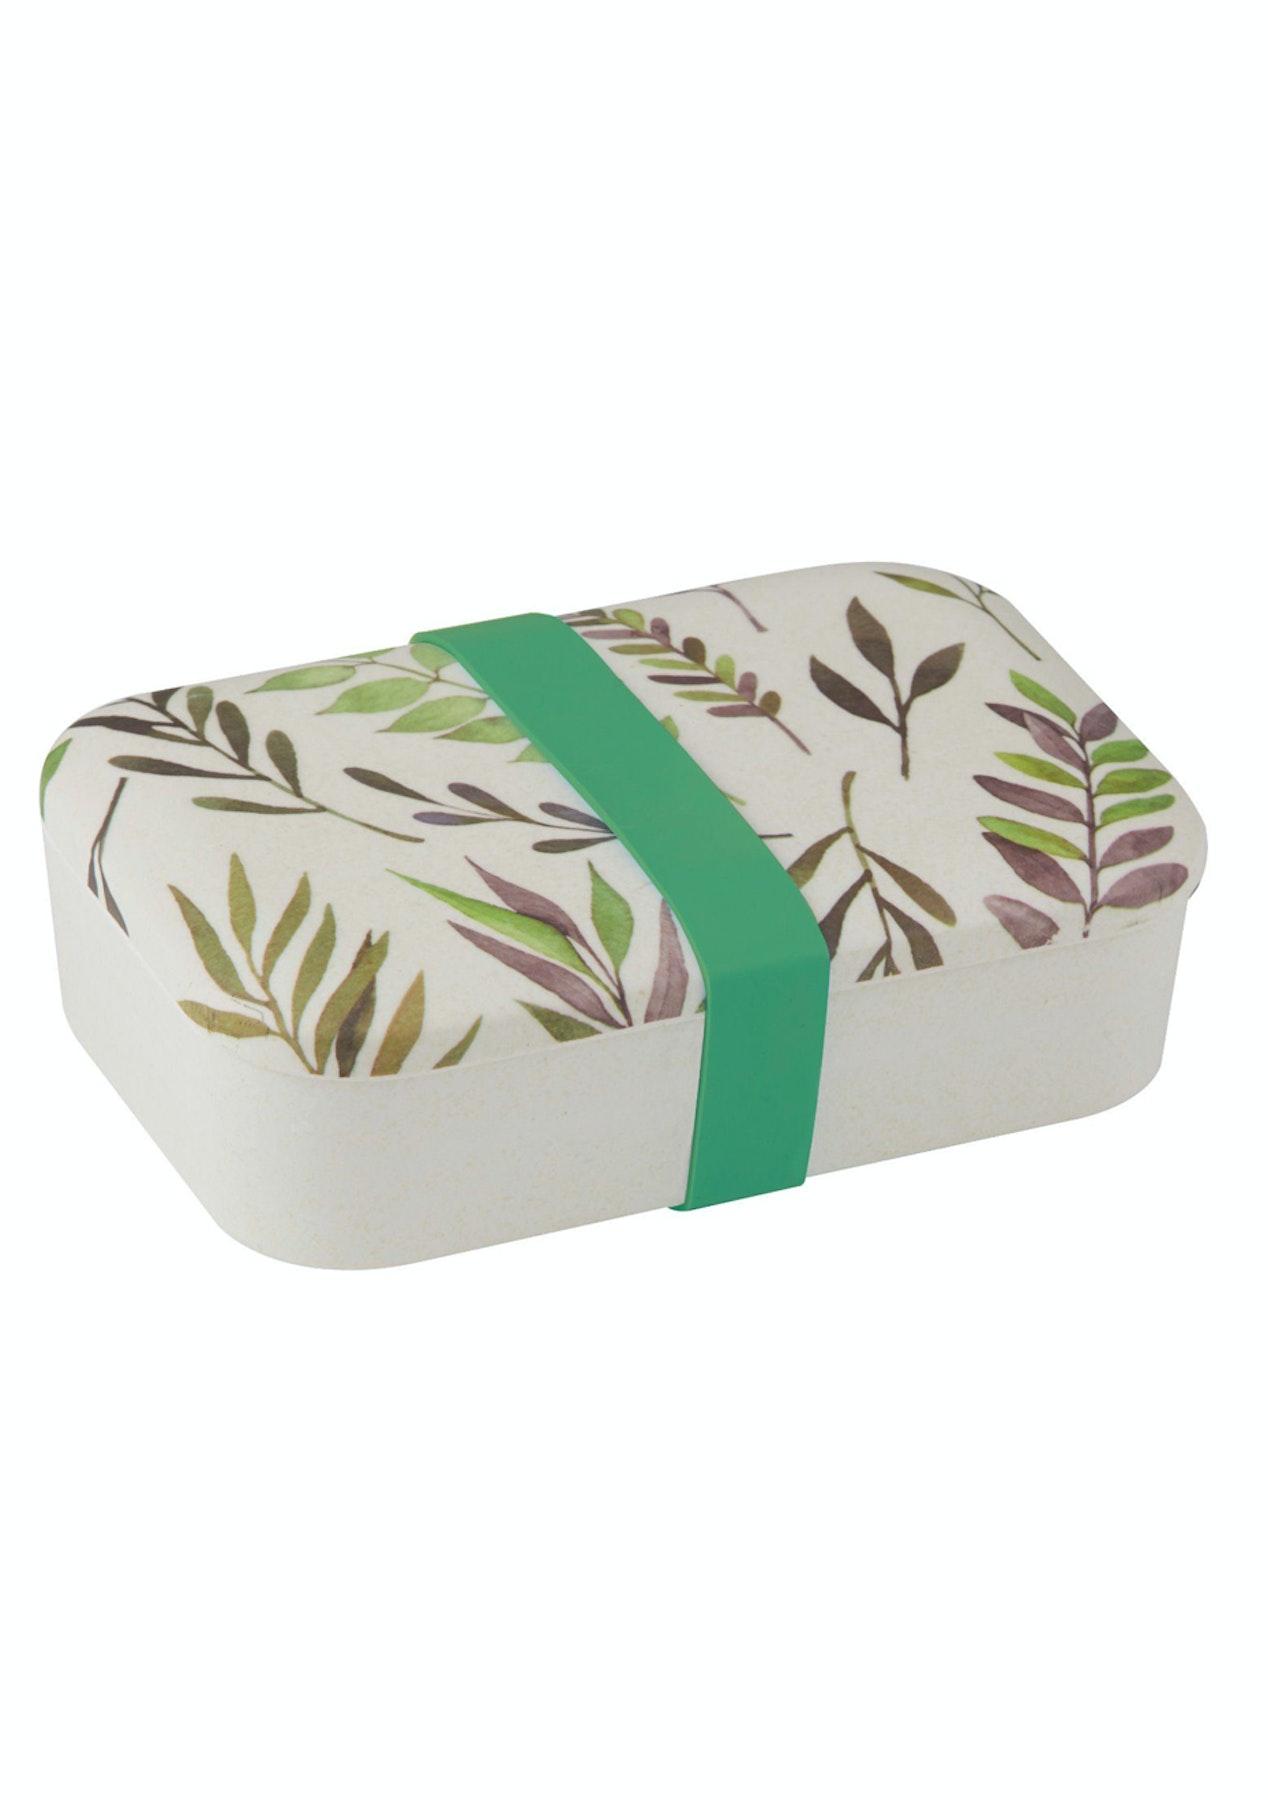 Davis & Waddell - Greenhouse Bamboo Fibre Lunch Box - Green/Natural